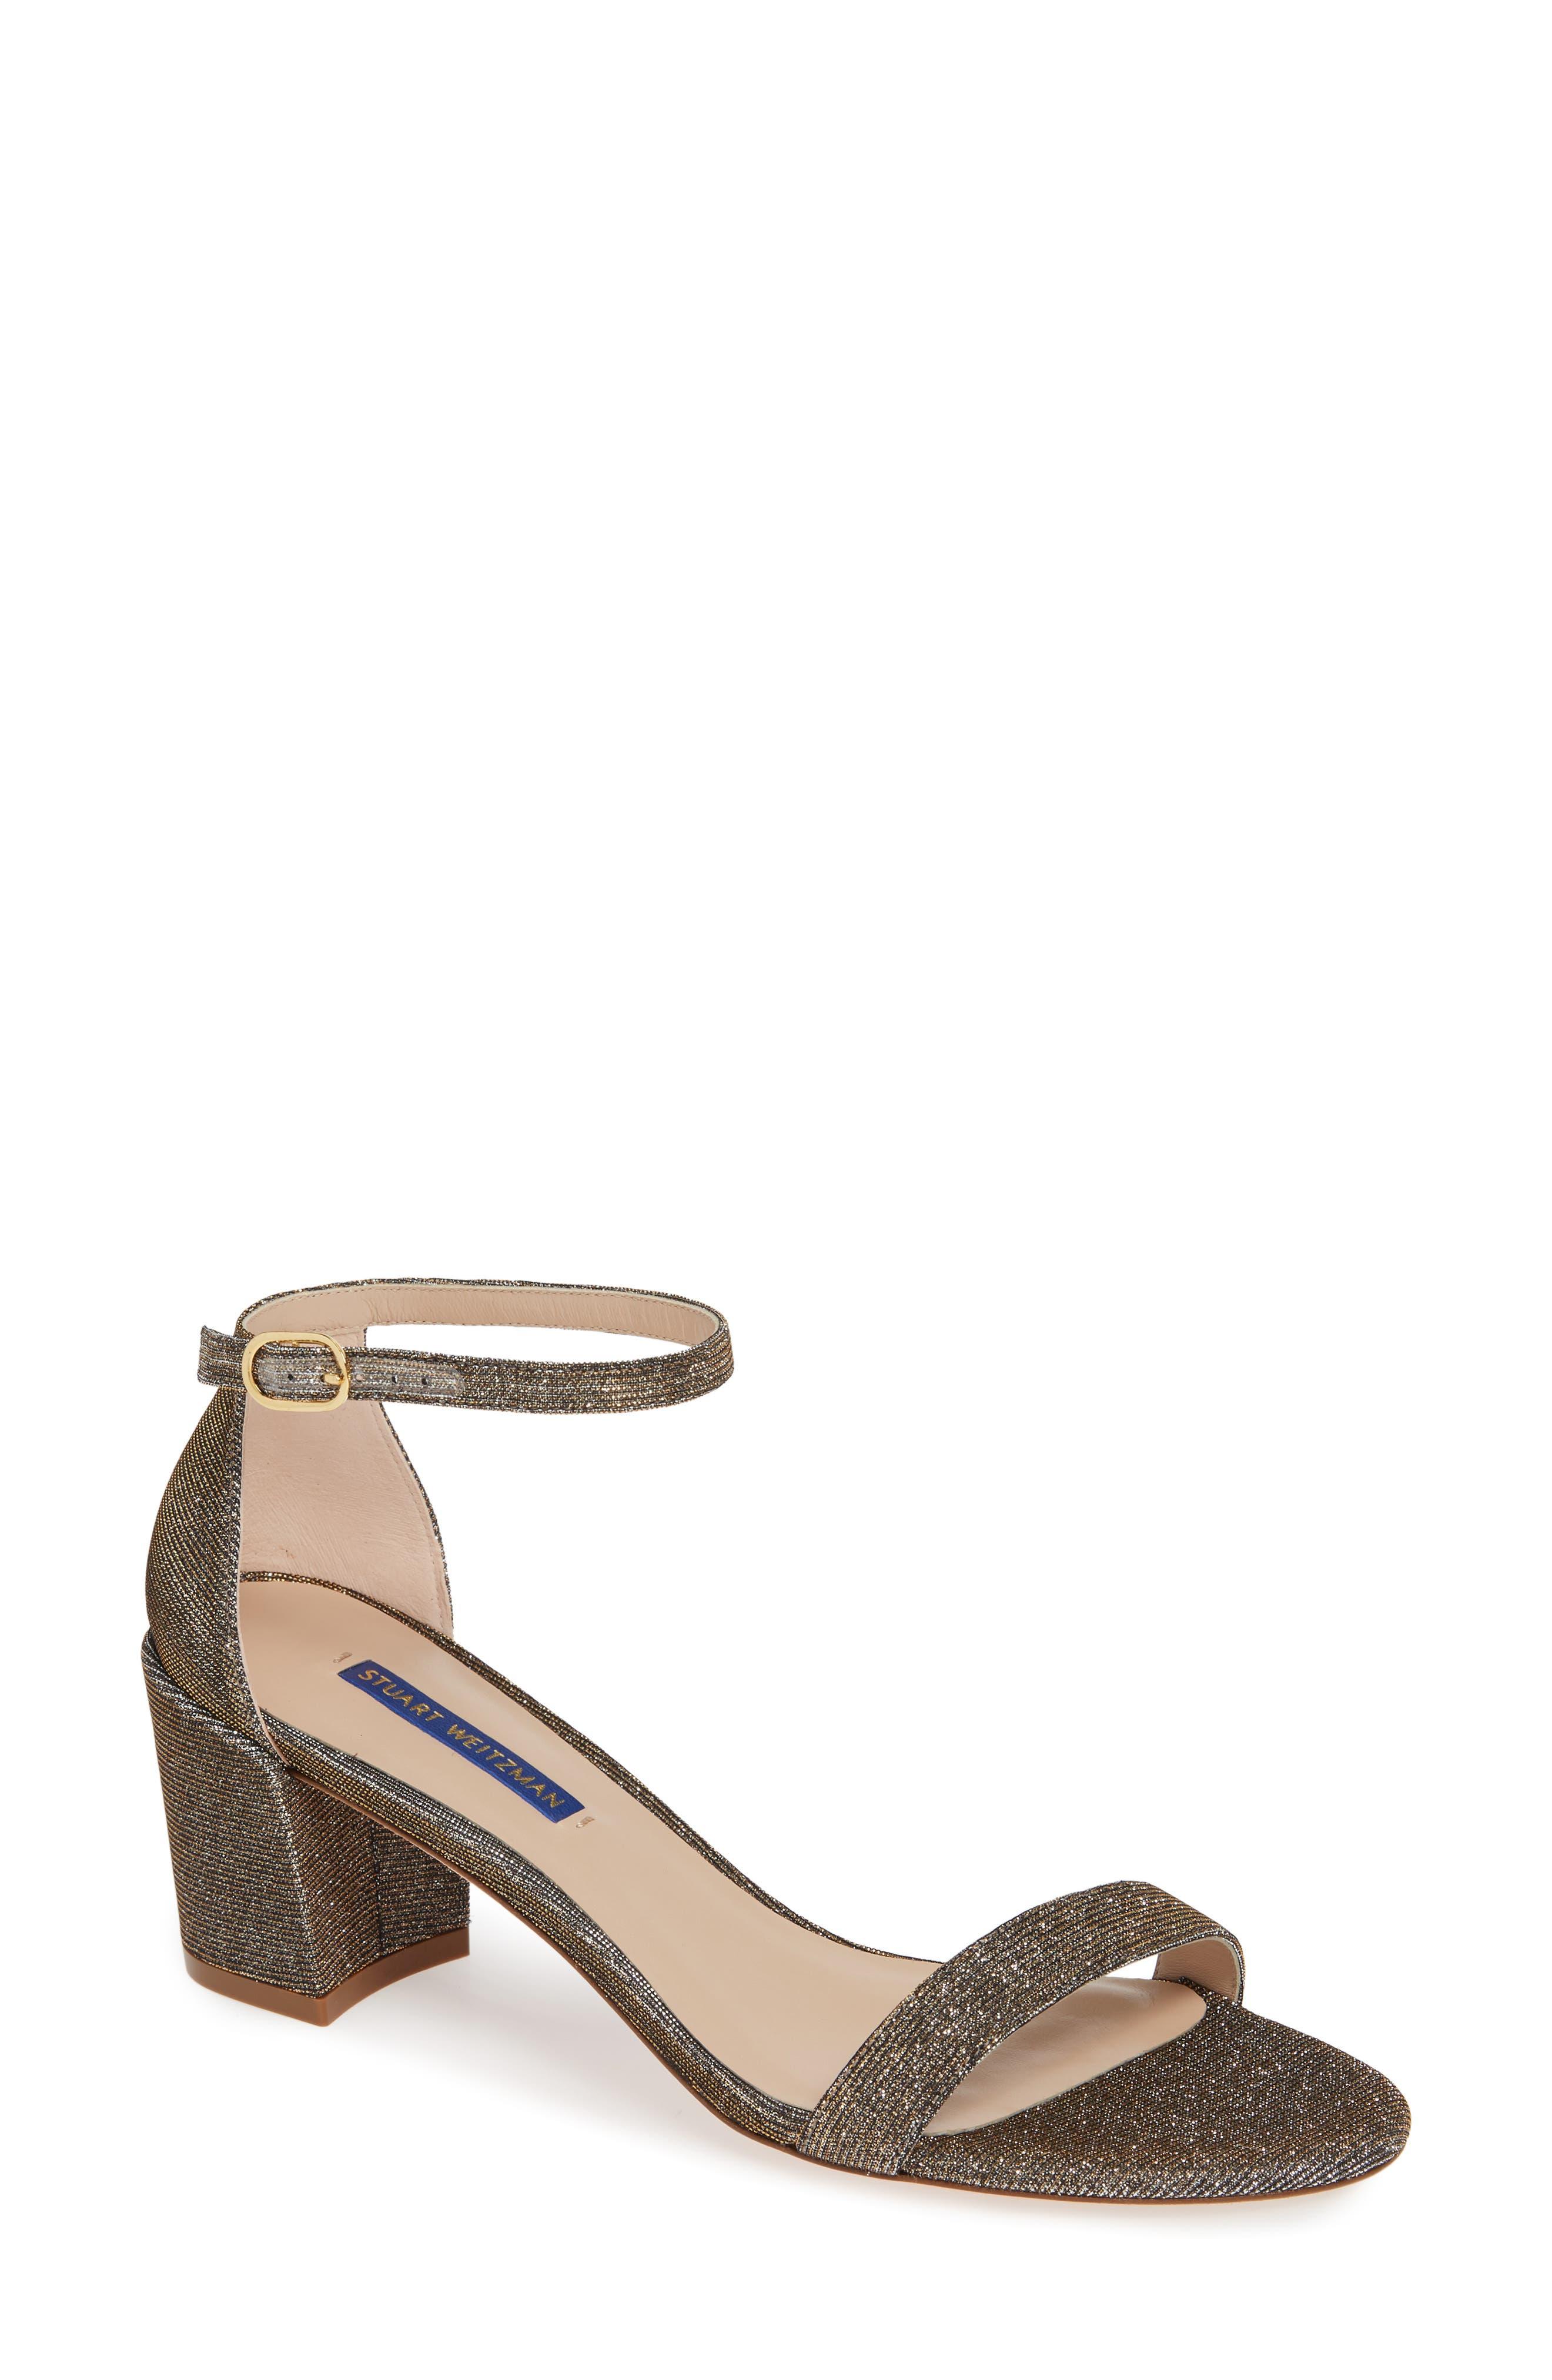 STUART WEITZMAN Simple Ankle Strap Sandal, Main, color, GOLD NIGHTTIME